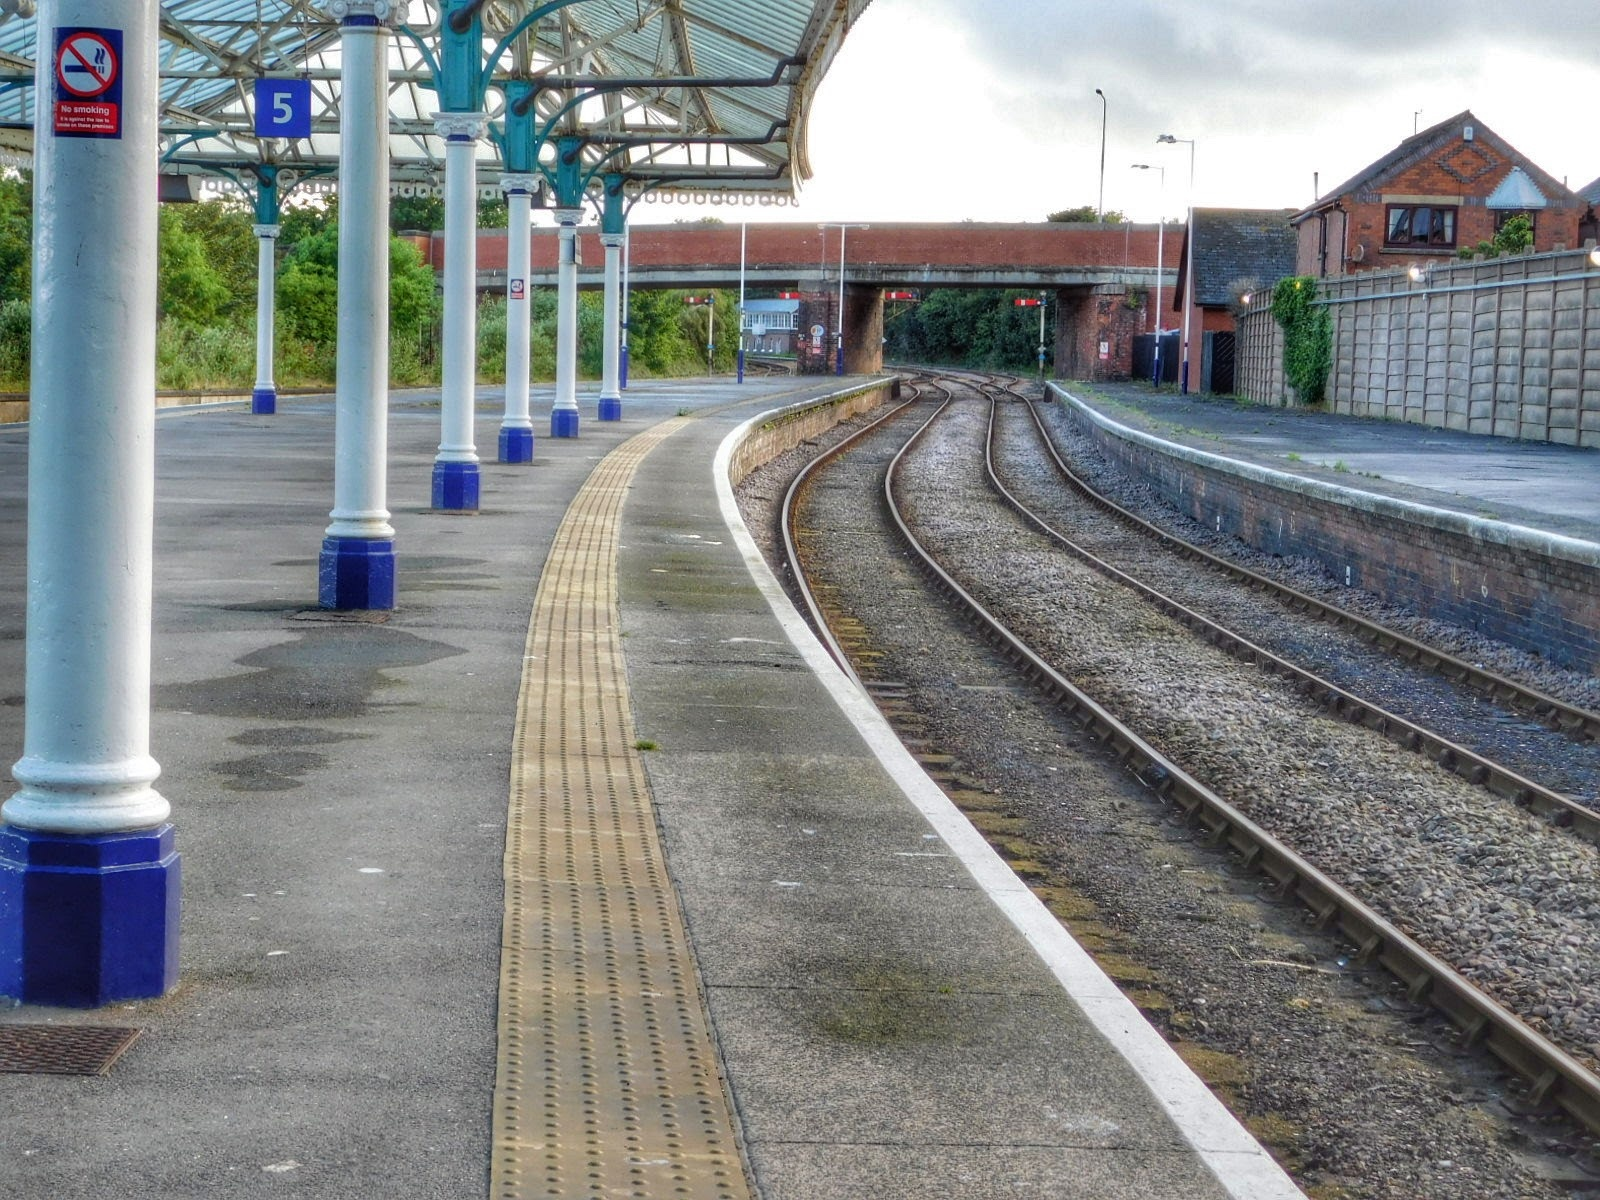 Platform 5 at Bridlington Railway Station, UK by Sheila Button